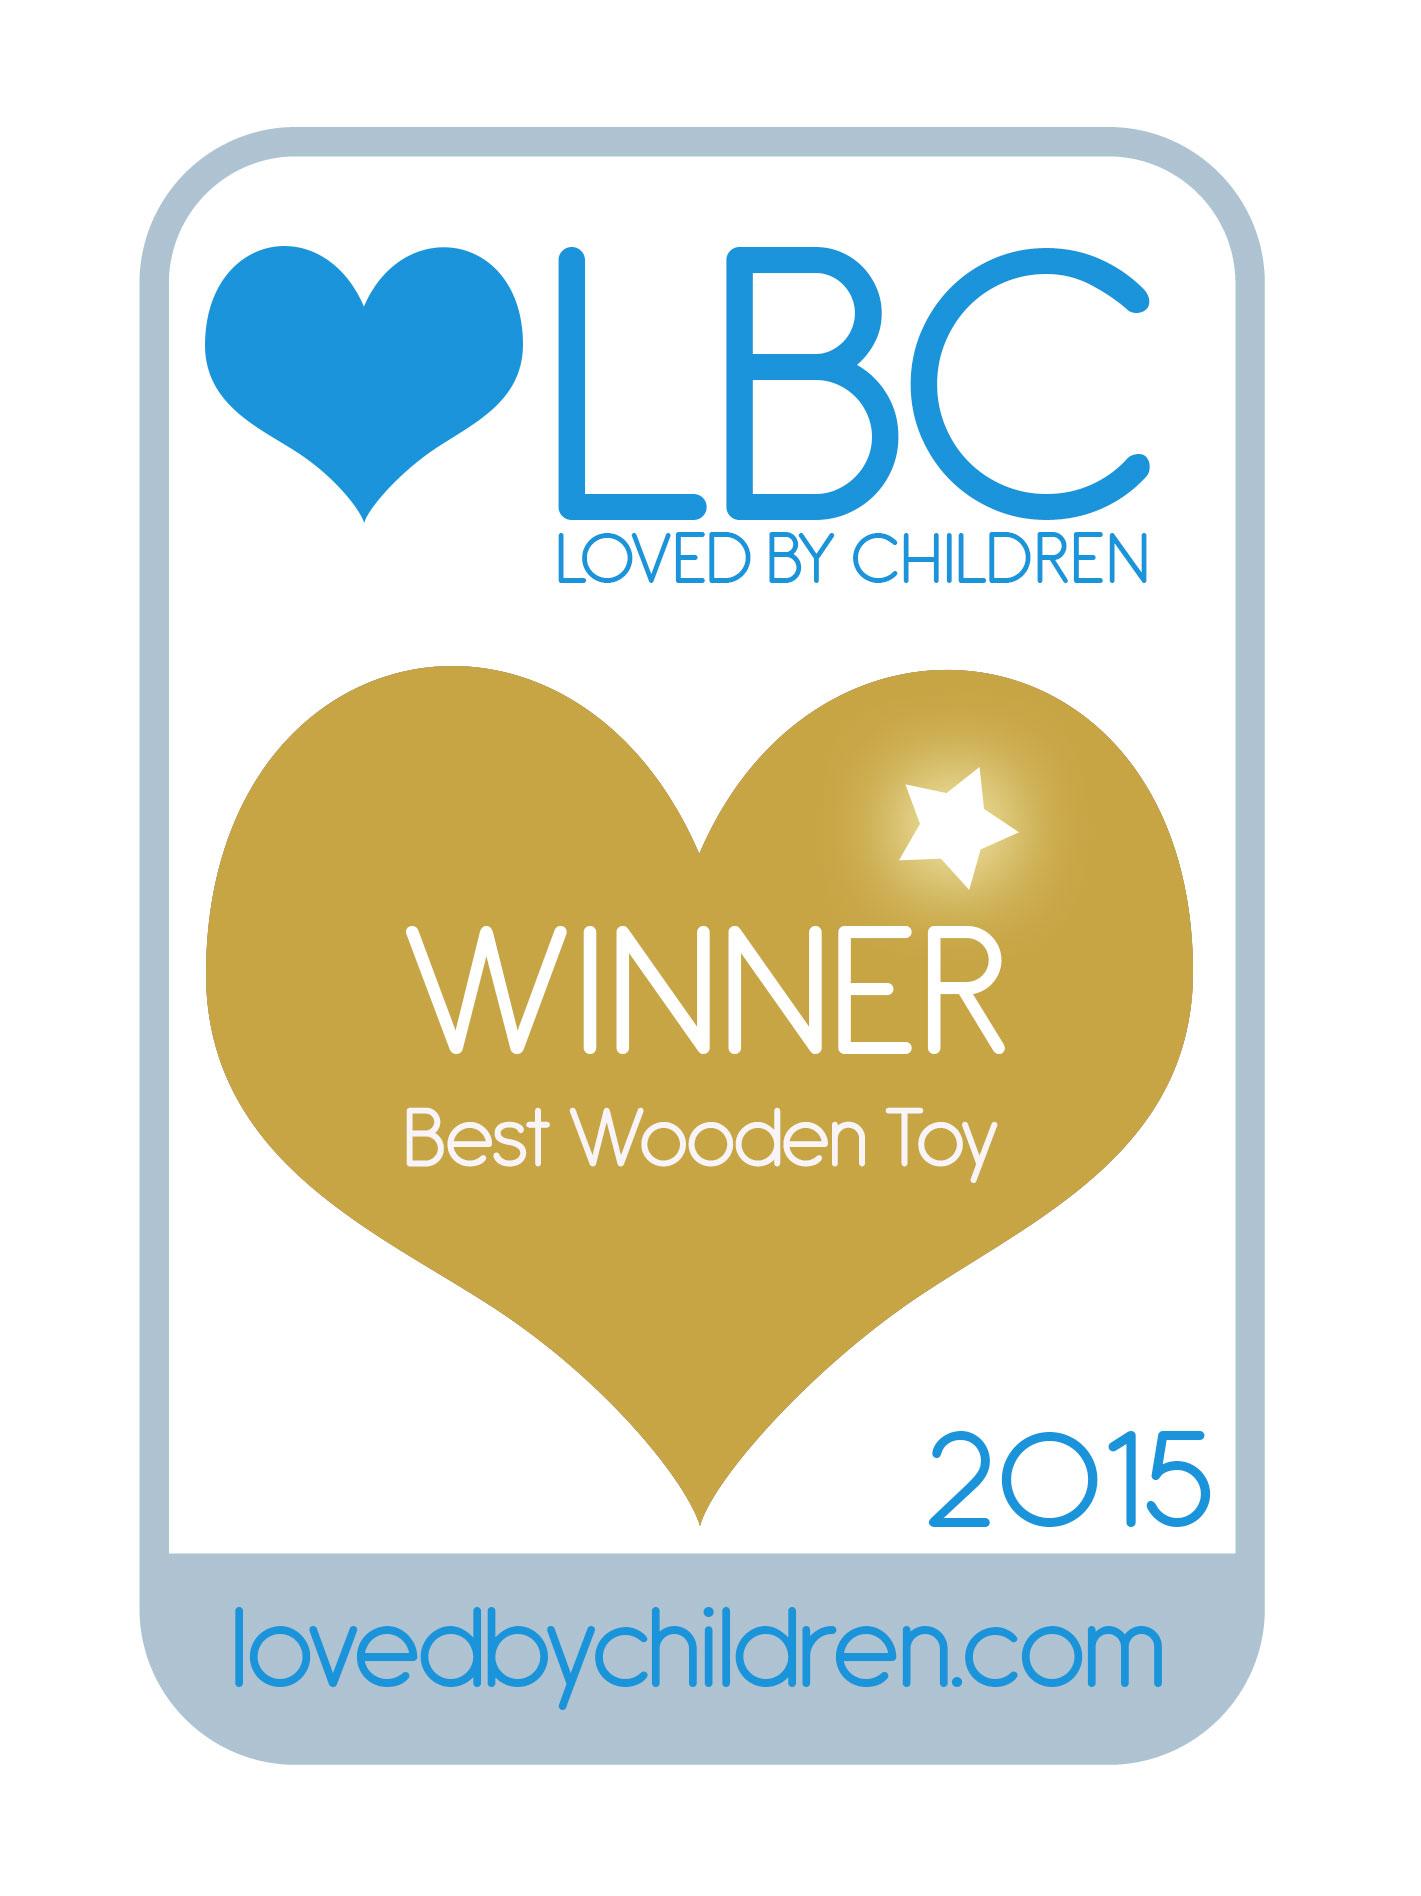 Kaleidoscope Le Toy Van Loved by Children Winner